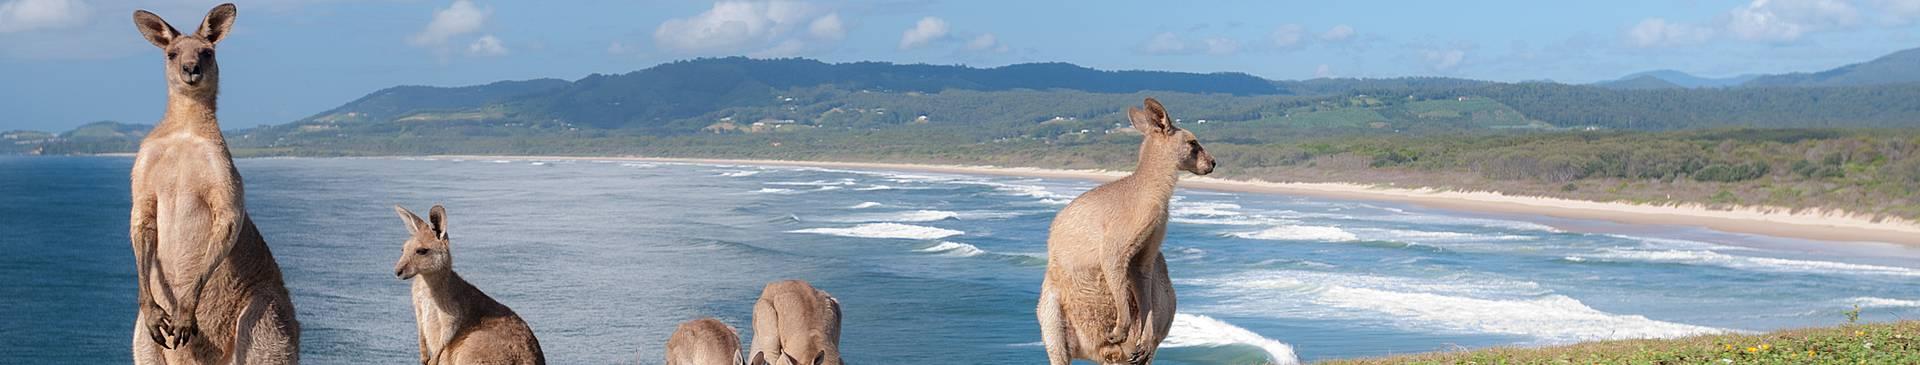 Australia in June